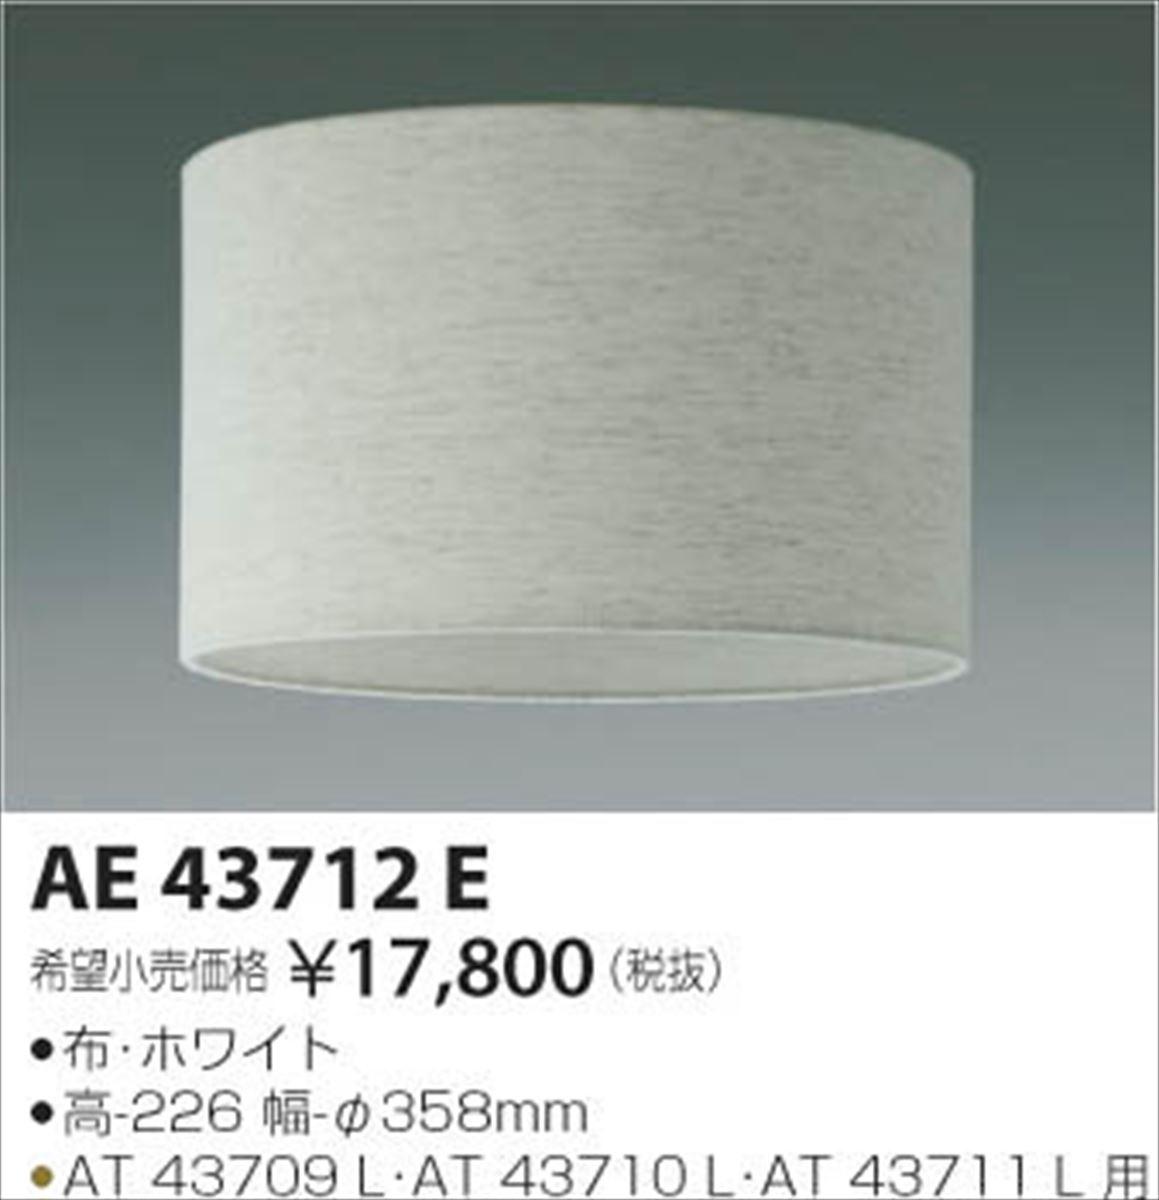 AE43712E セード ※対応器具ご確認ください コイズミ照明 (KA) 照明器具